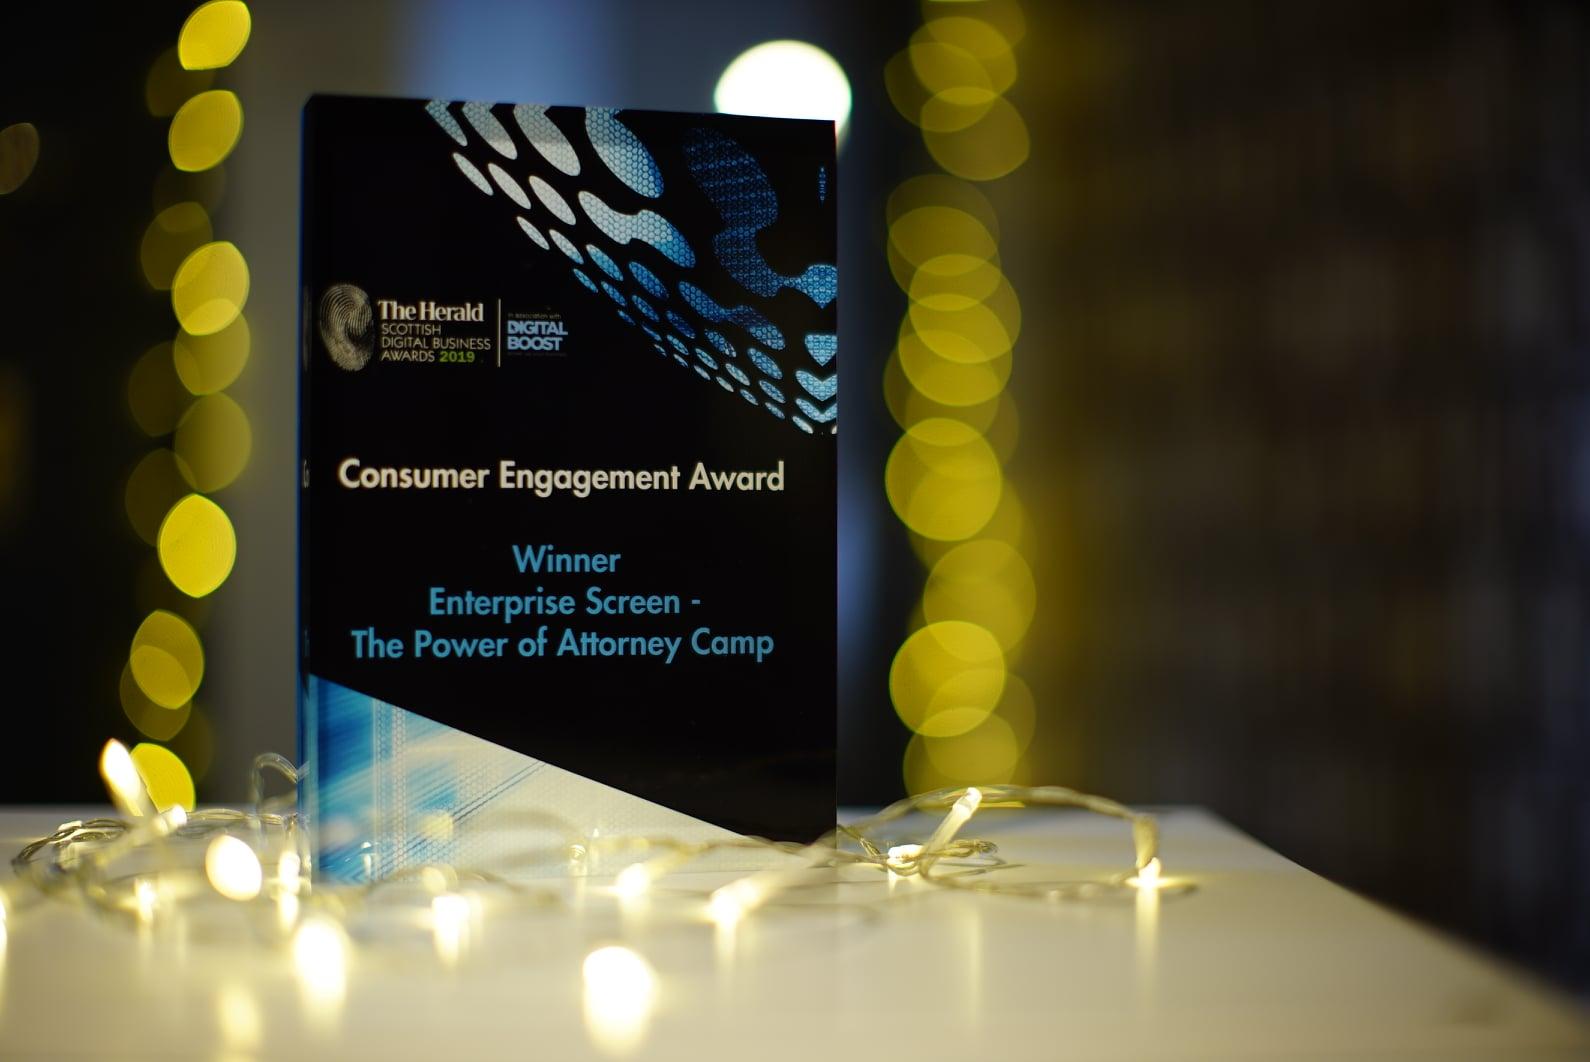 Award winning digital agency! Enterprise Screen!